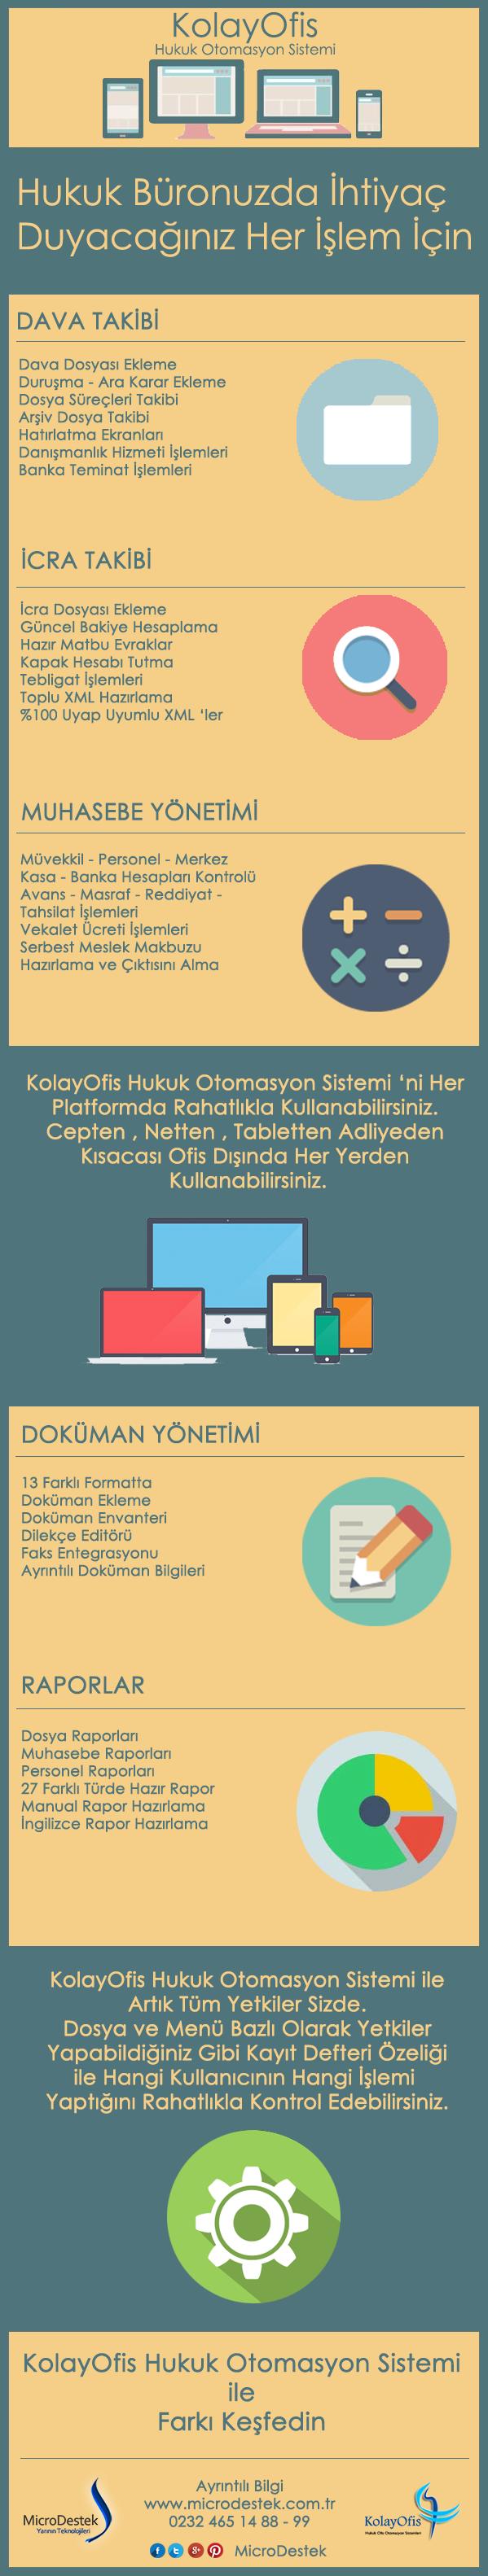 KolayOfis Hukuk Otomasyon Sistemi - İnfografik